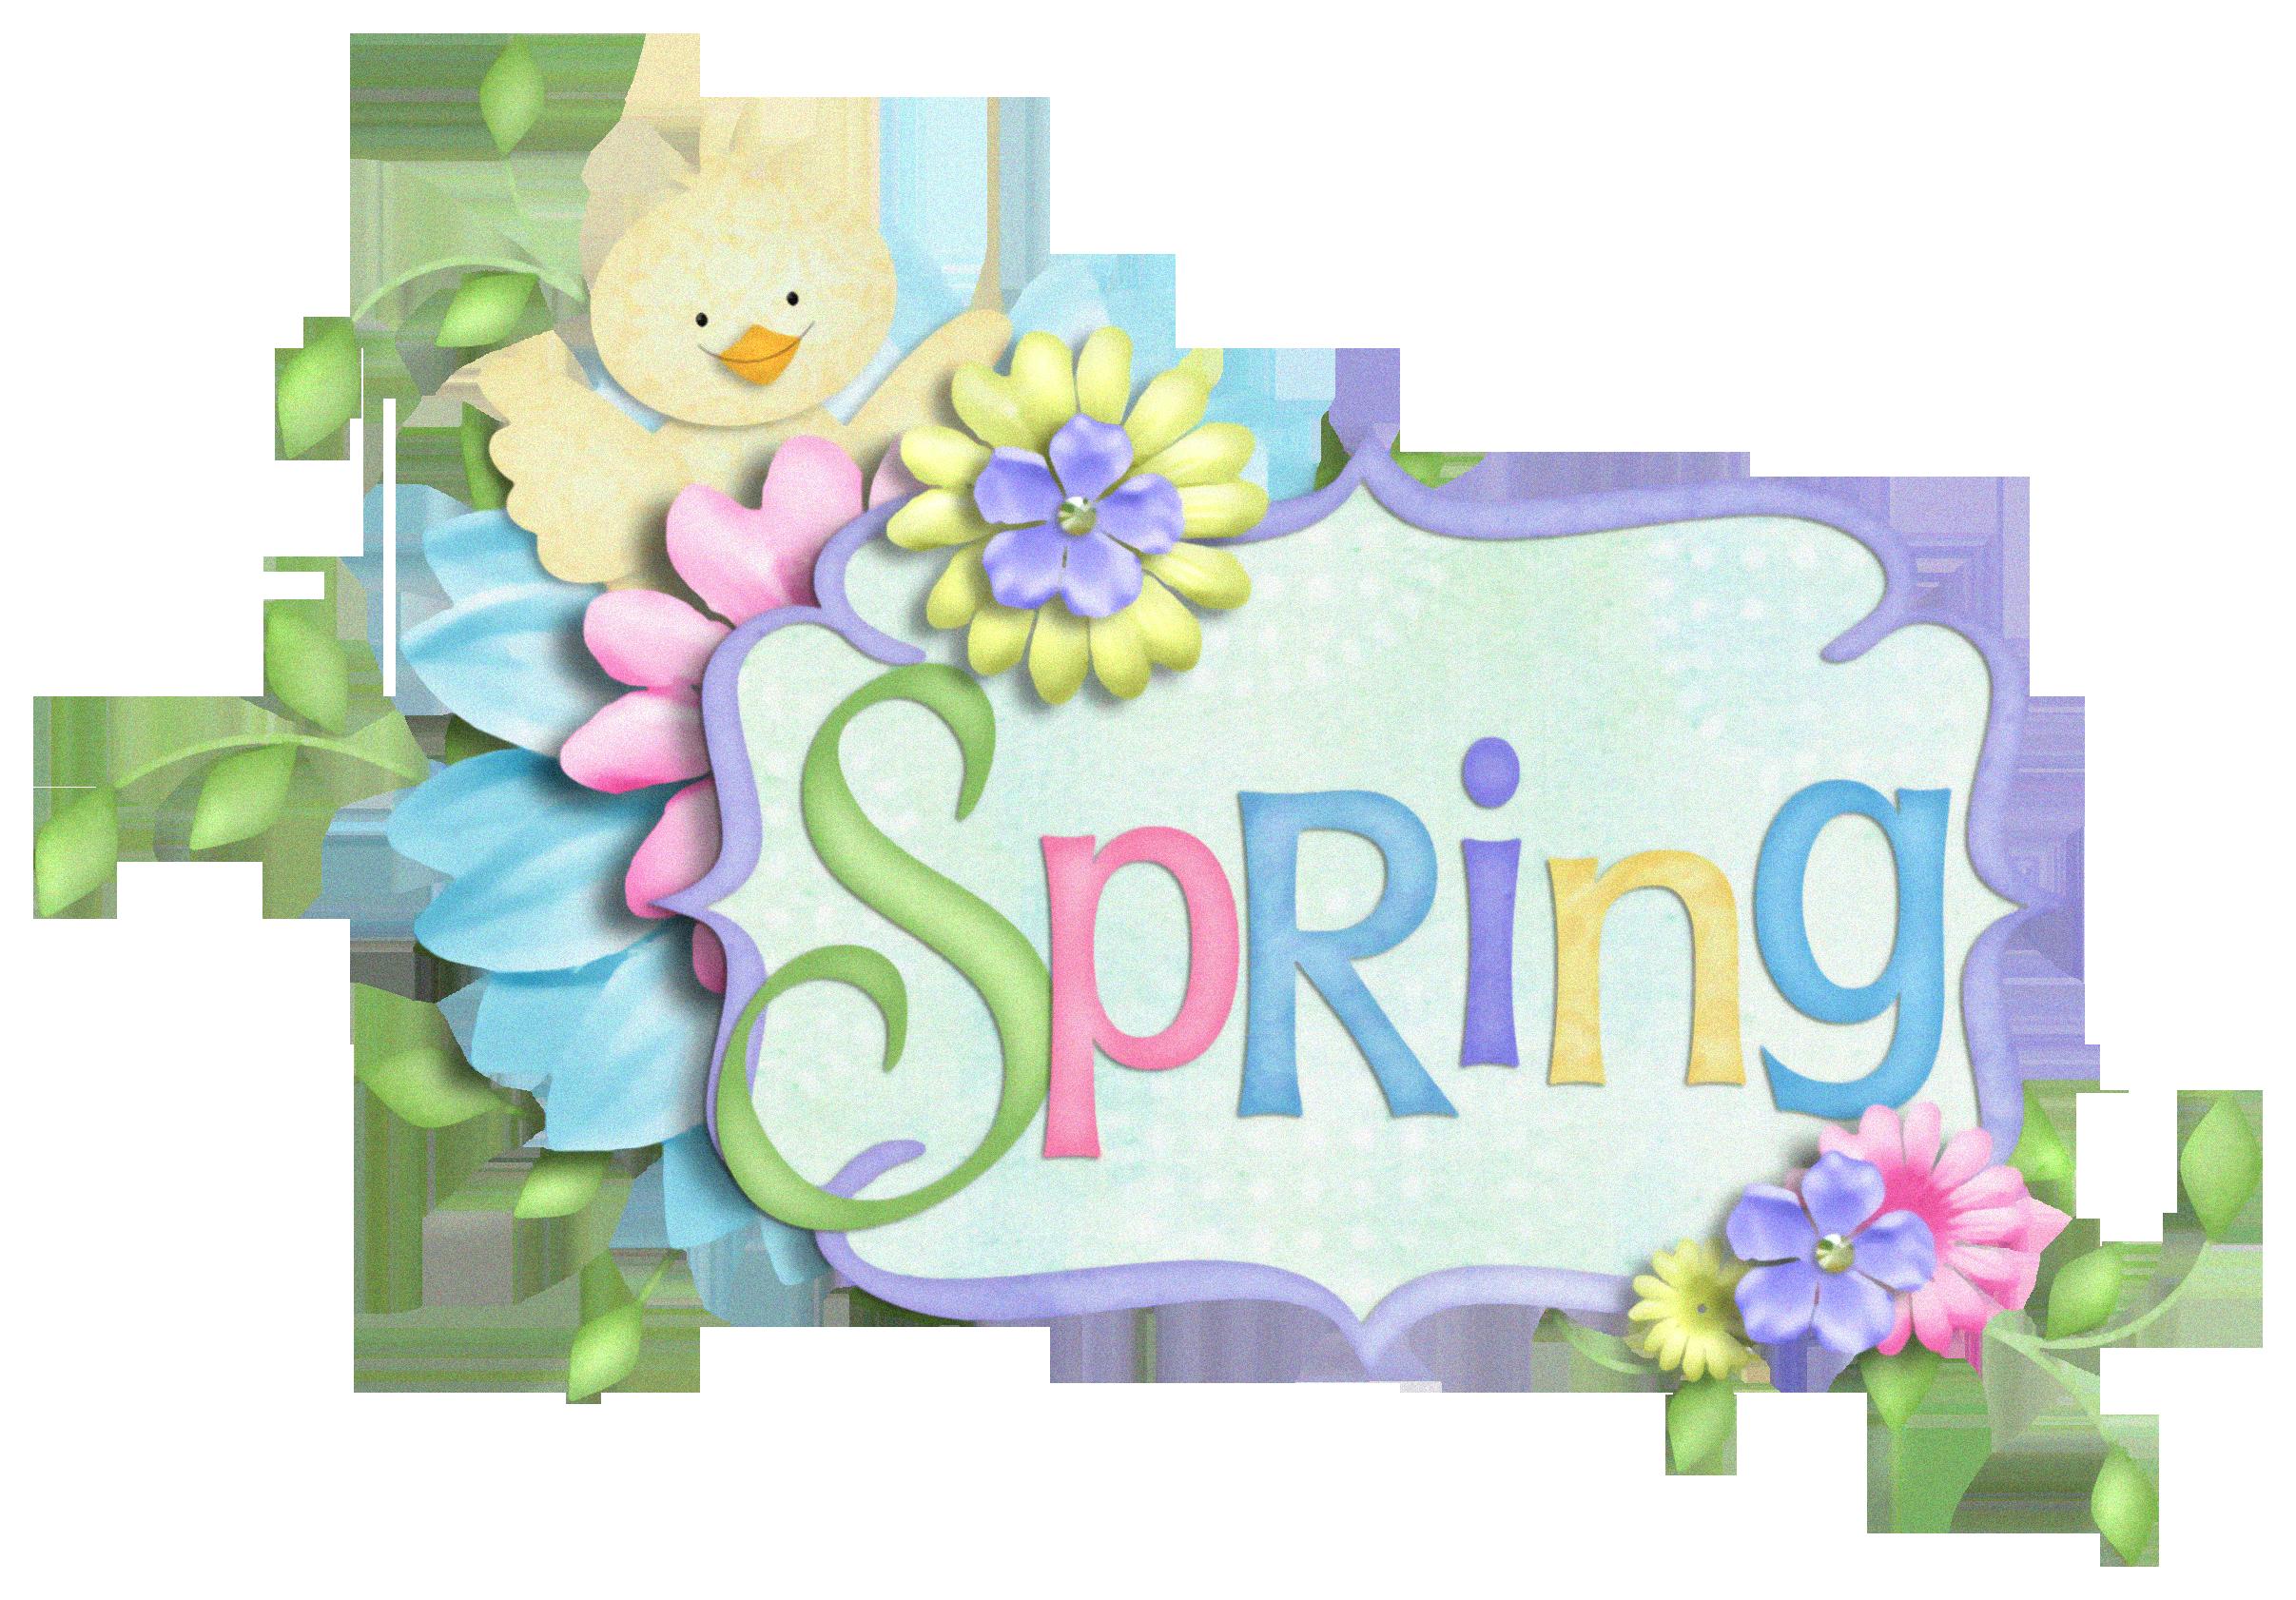 Poem clipart spring. Decor png picture pinterest